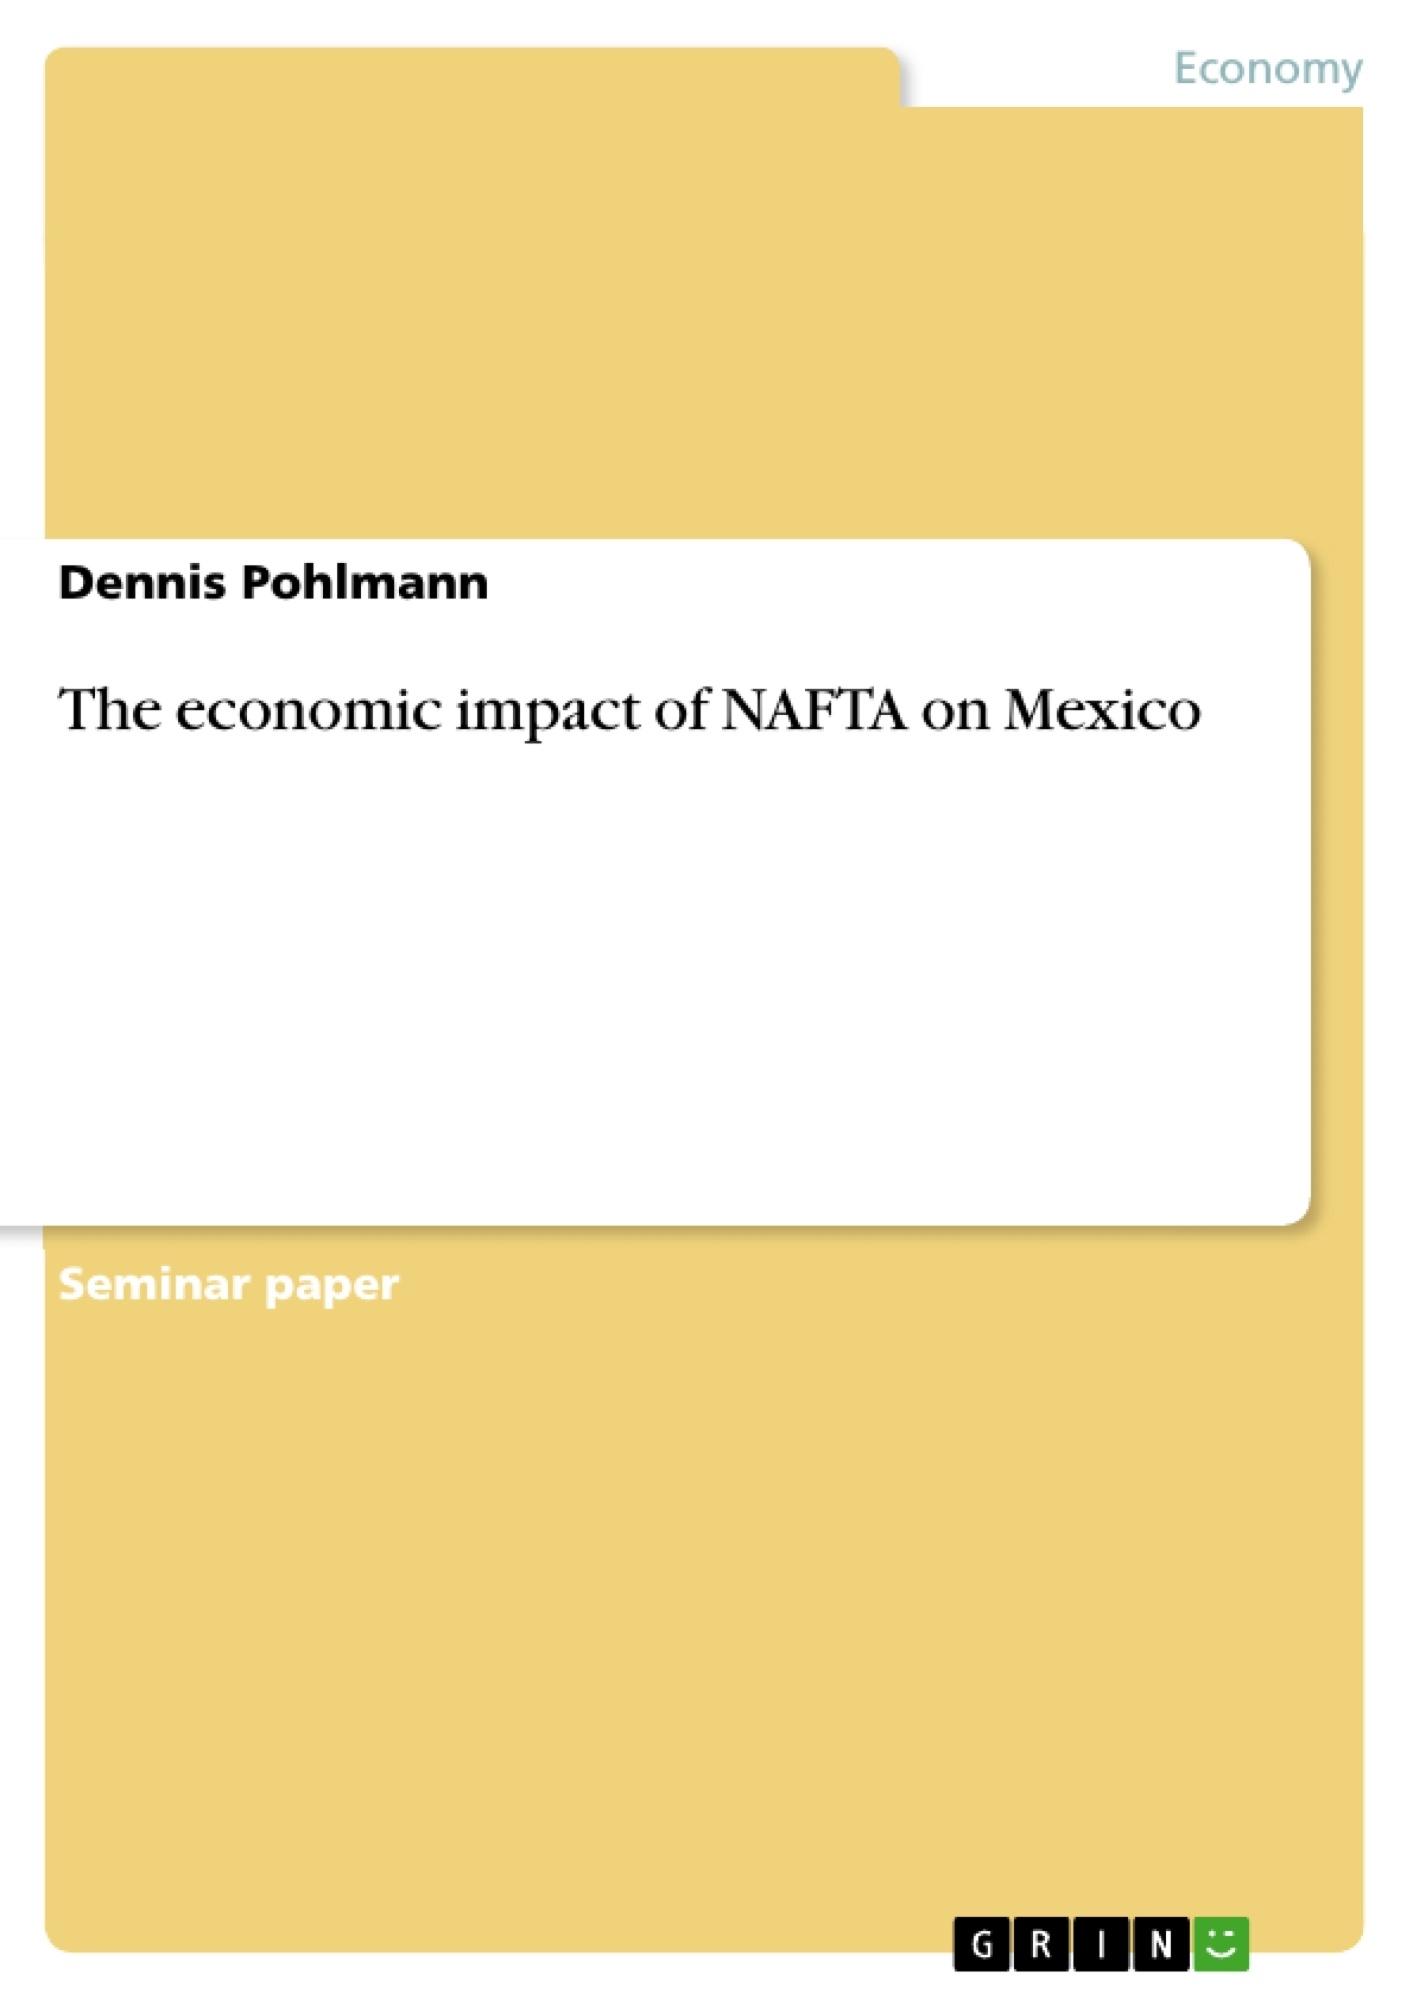 Title: The economic impact of NAFTA on Mexico